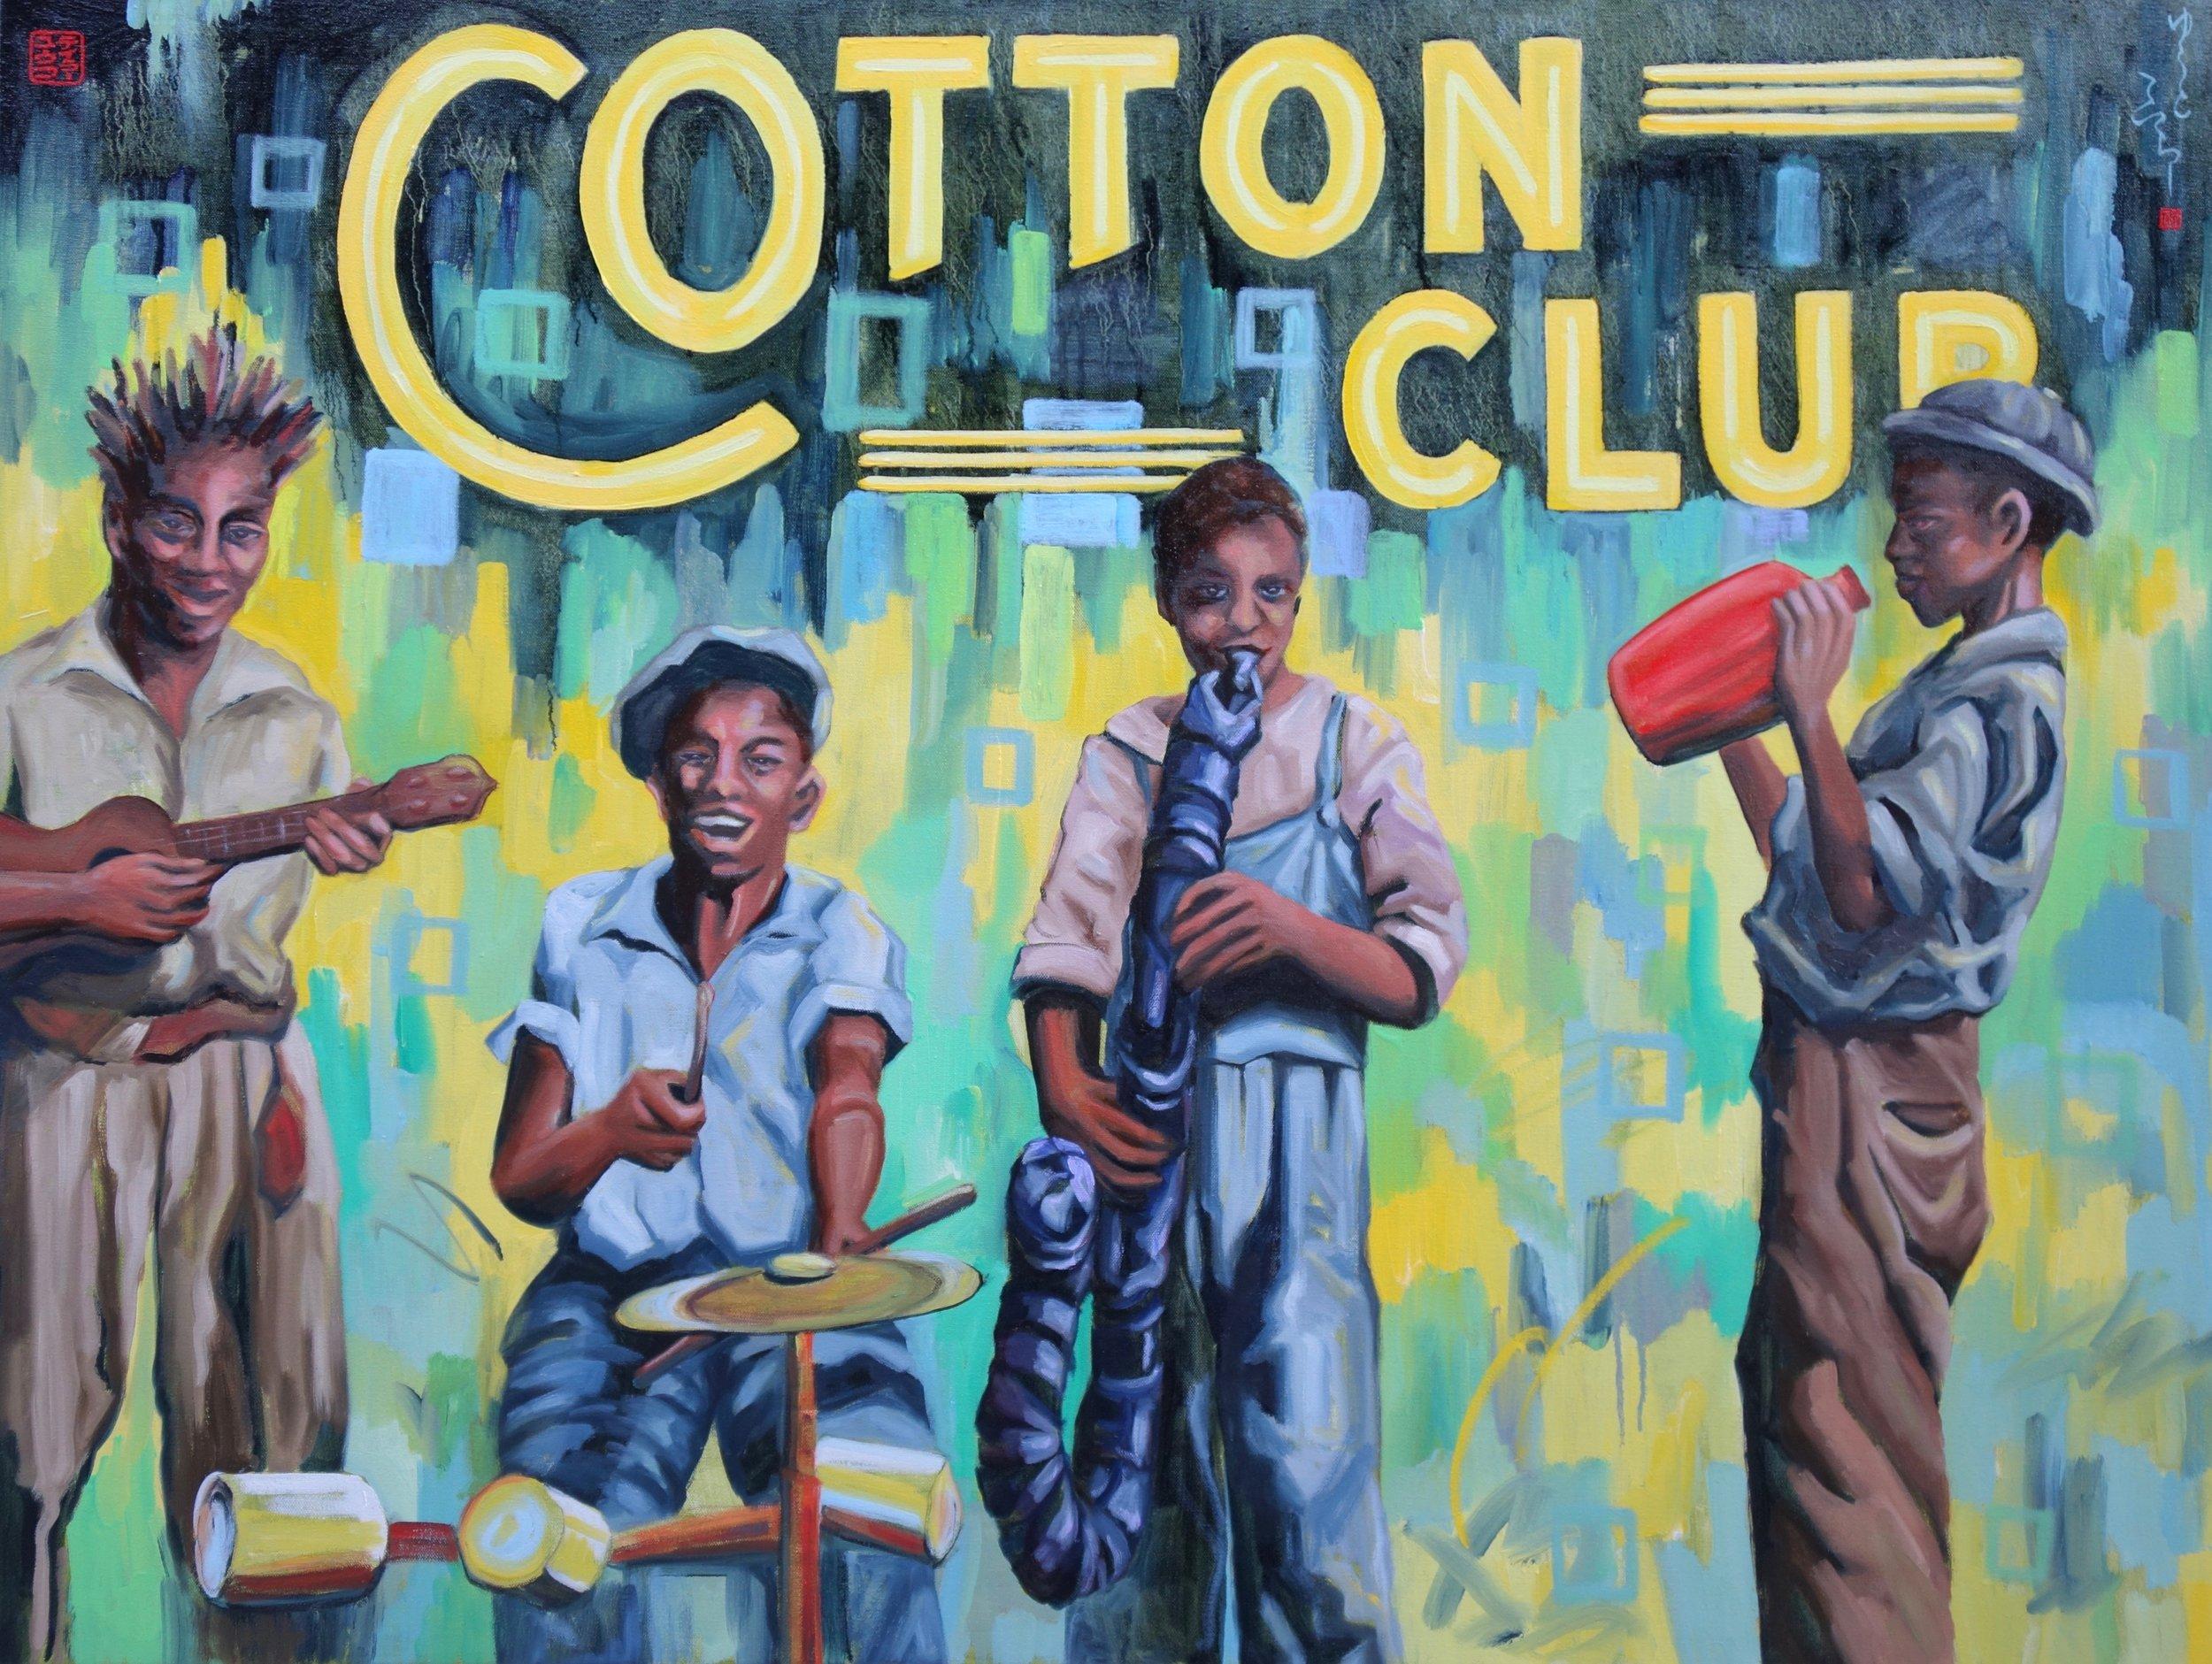 Cotton Club - Swinging Dreams III